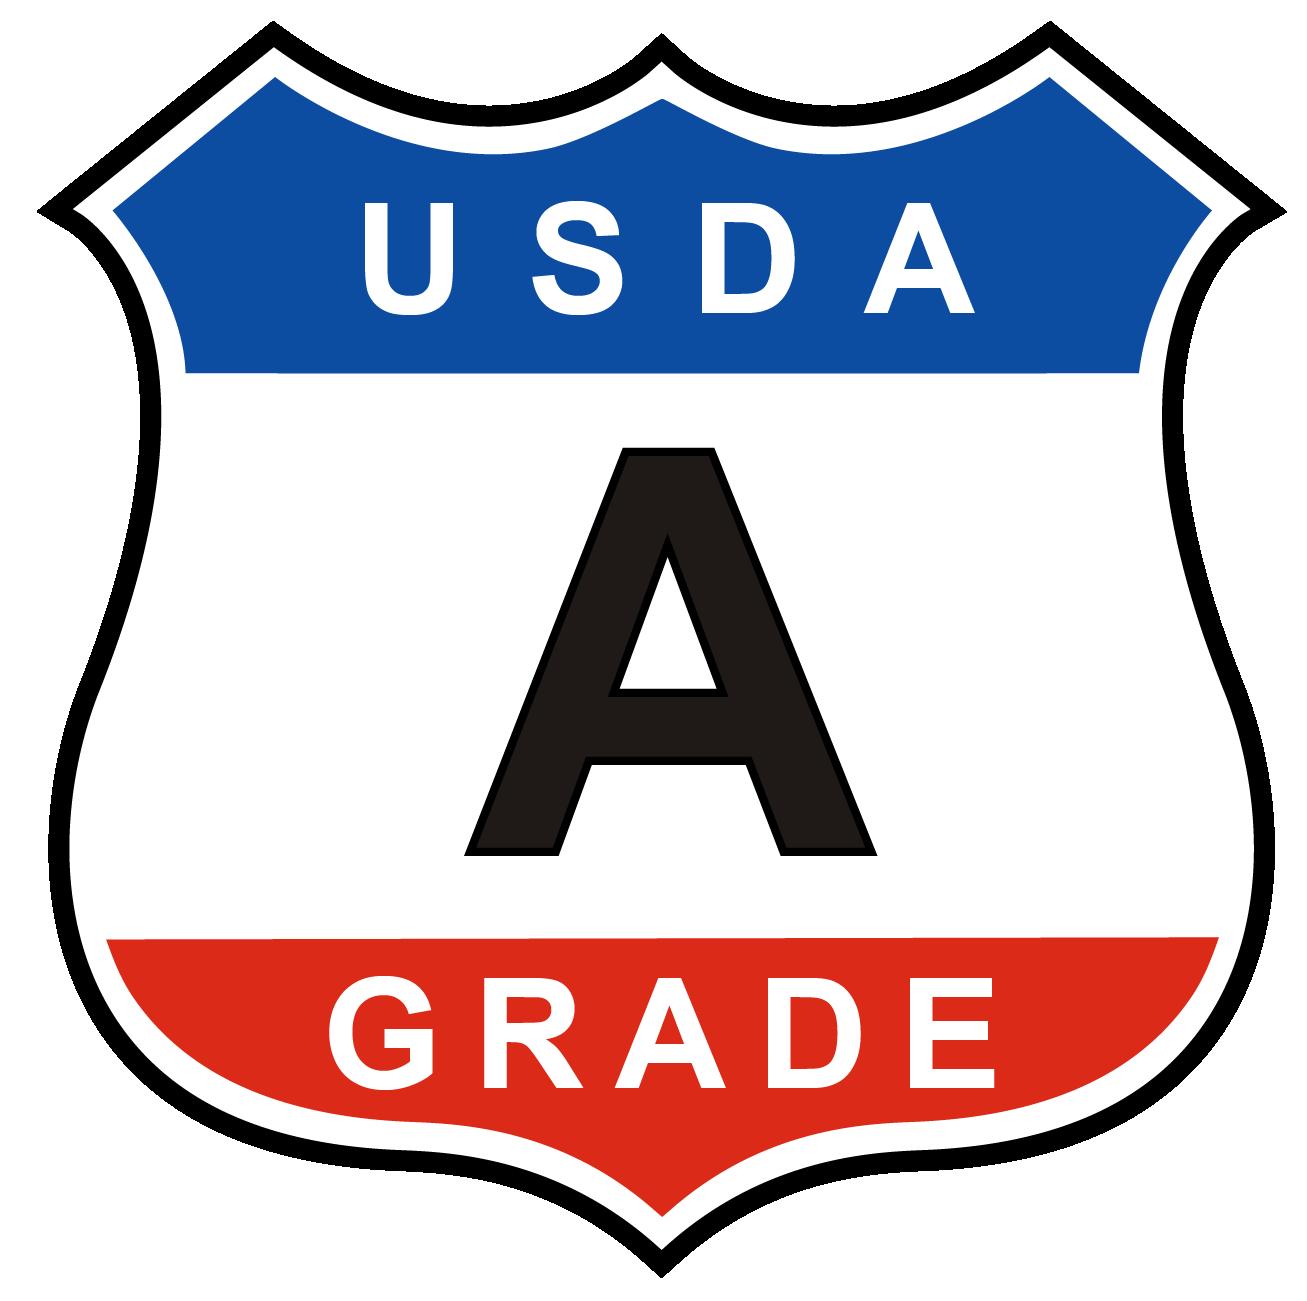 Egg grading shields agricultural. Grades clipart graded work